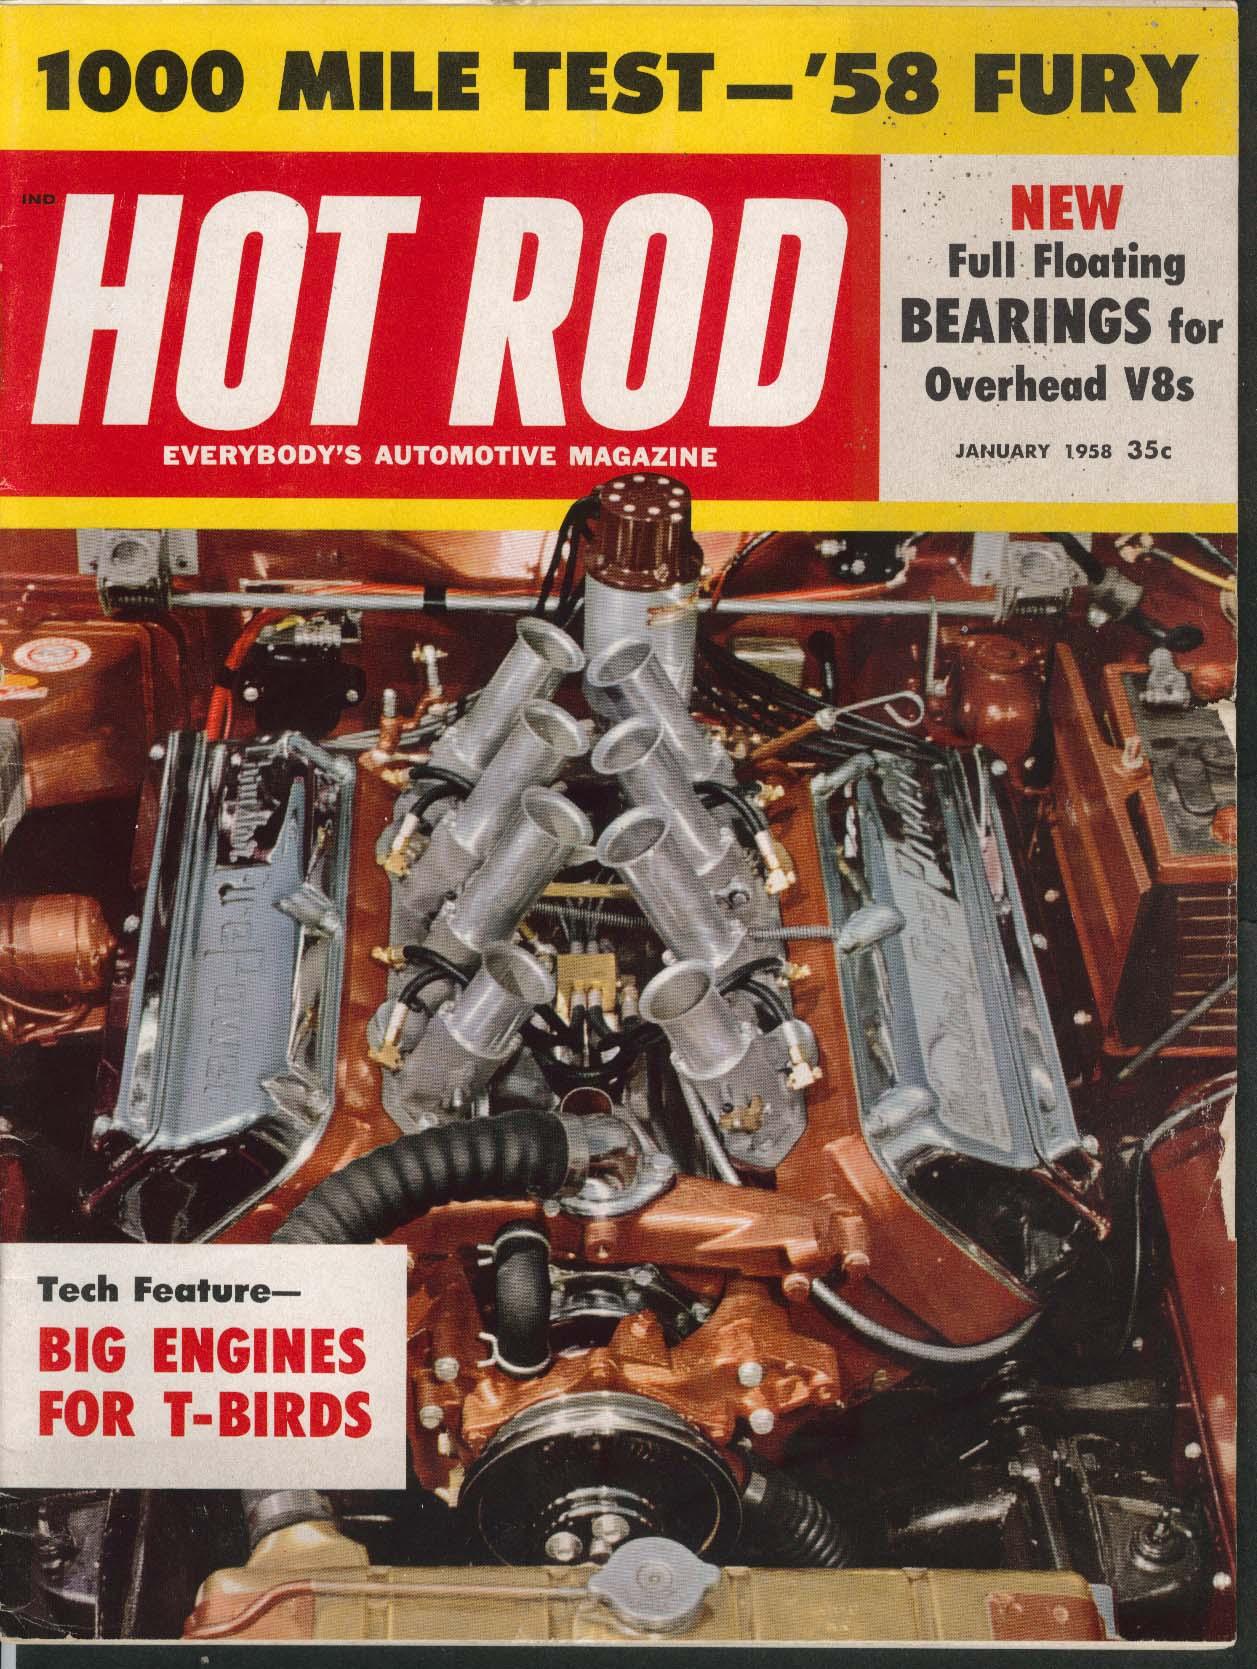 Image for HOT ROD Plymouth Fury 1000 mile test Thunderbird V8 1 1958